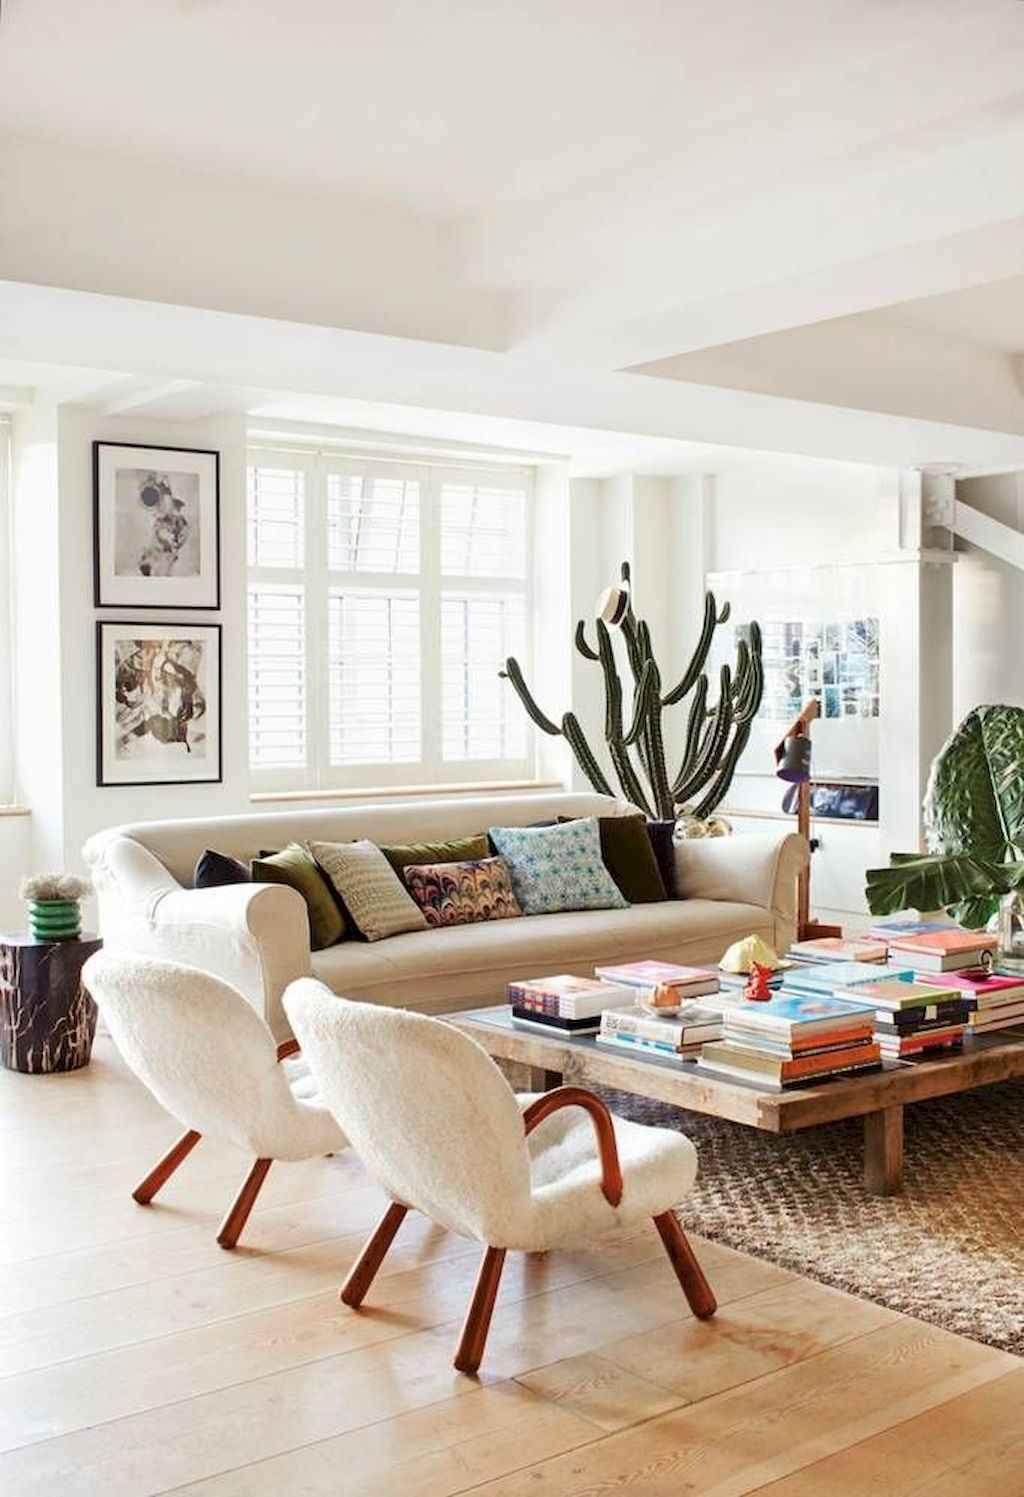 Simple clean vintage living room decorating ideas (29)